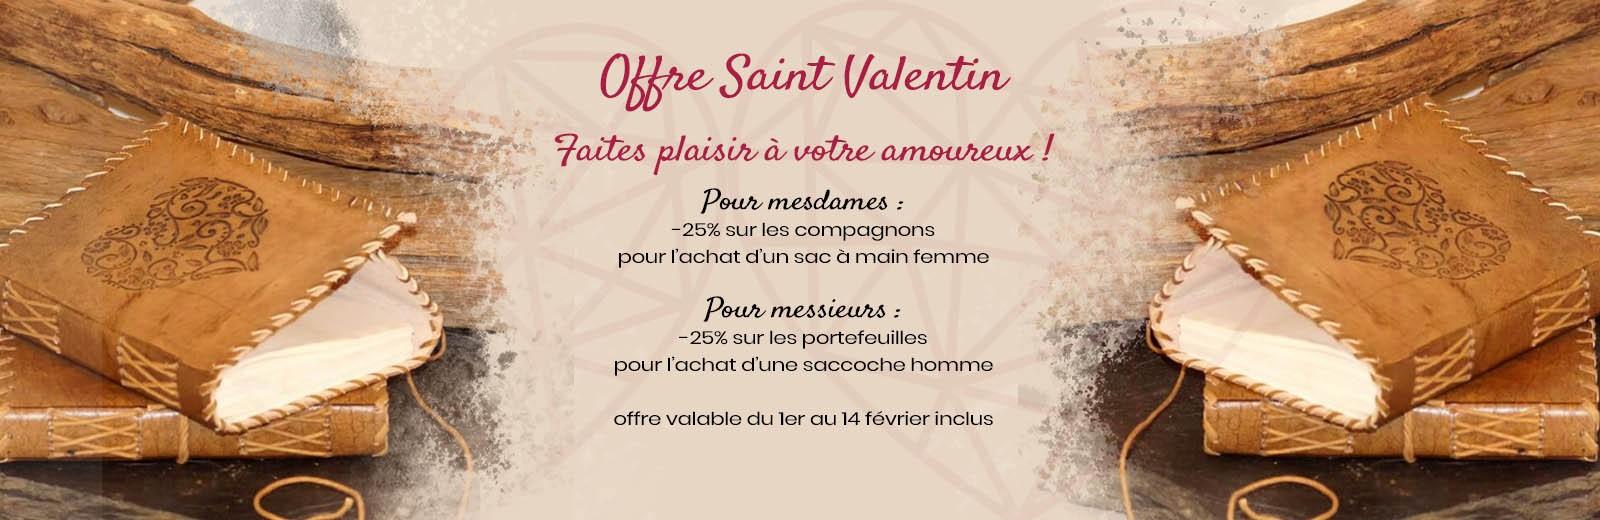 offre saint valentin